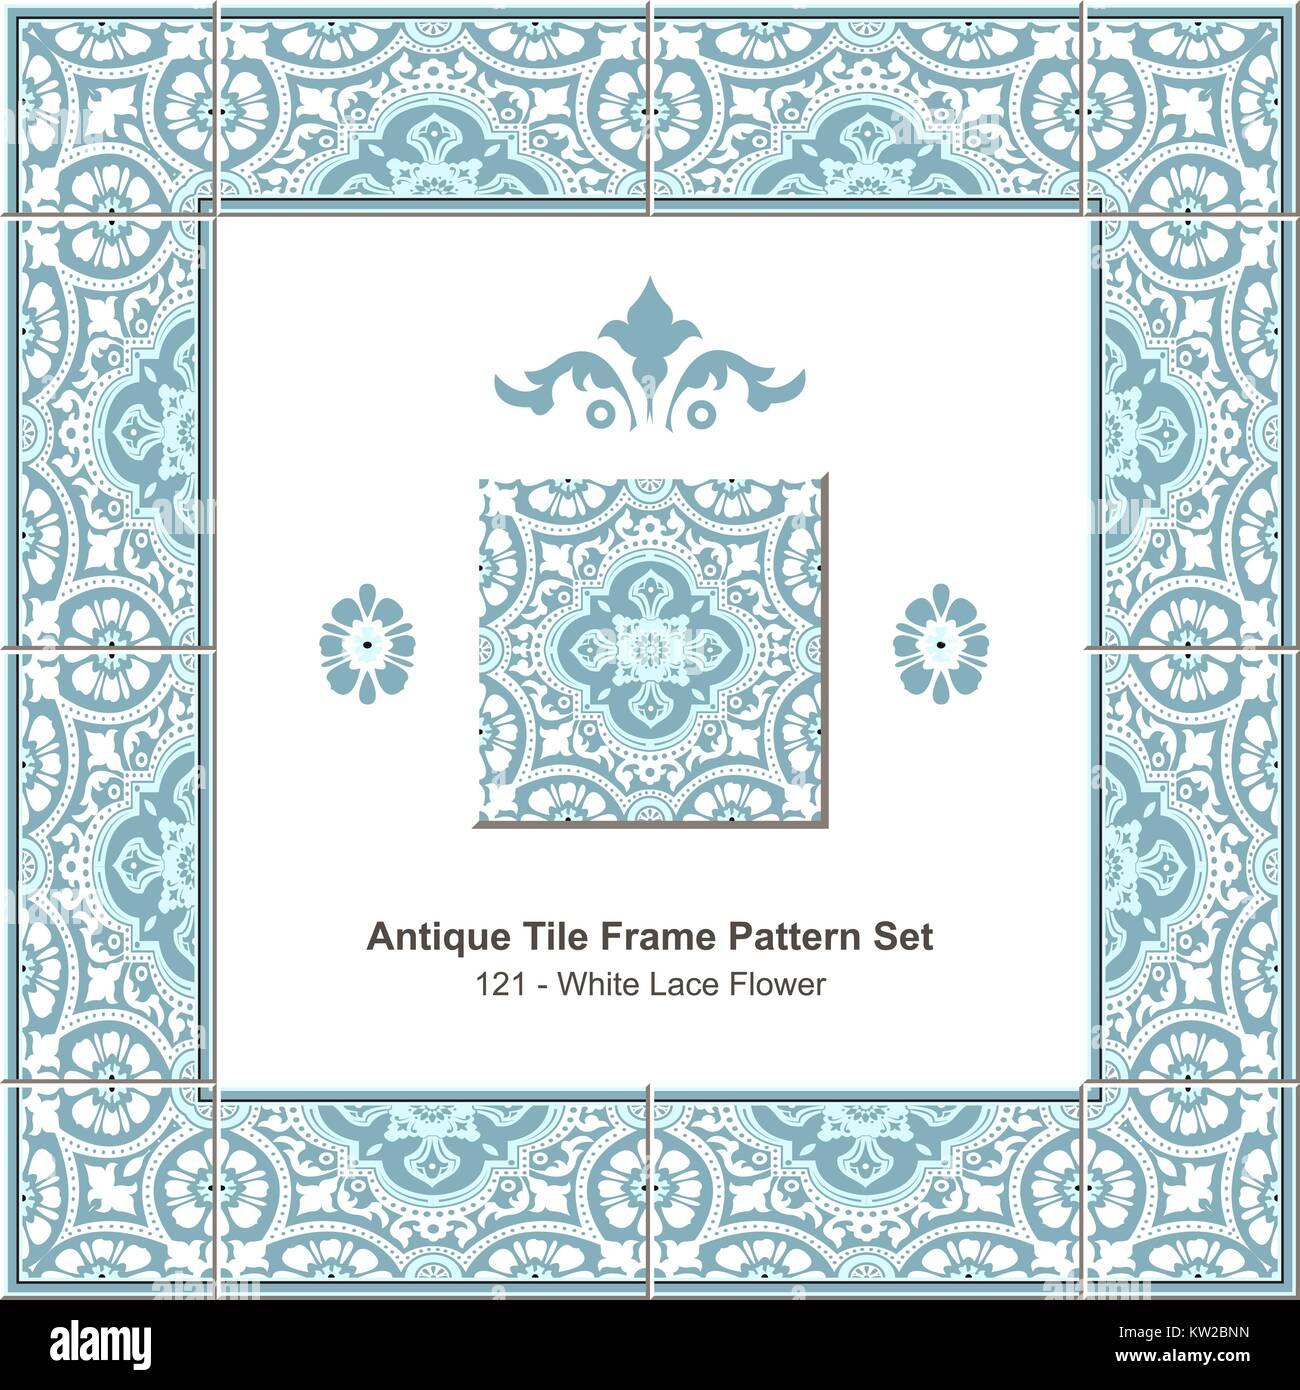 Antique tile frame pattern set Elegant Blue White Lace Flower Stock ...